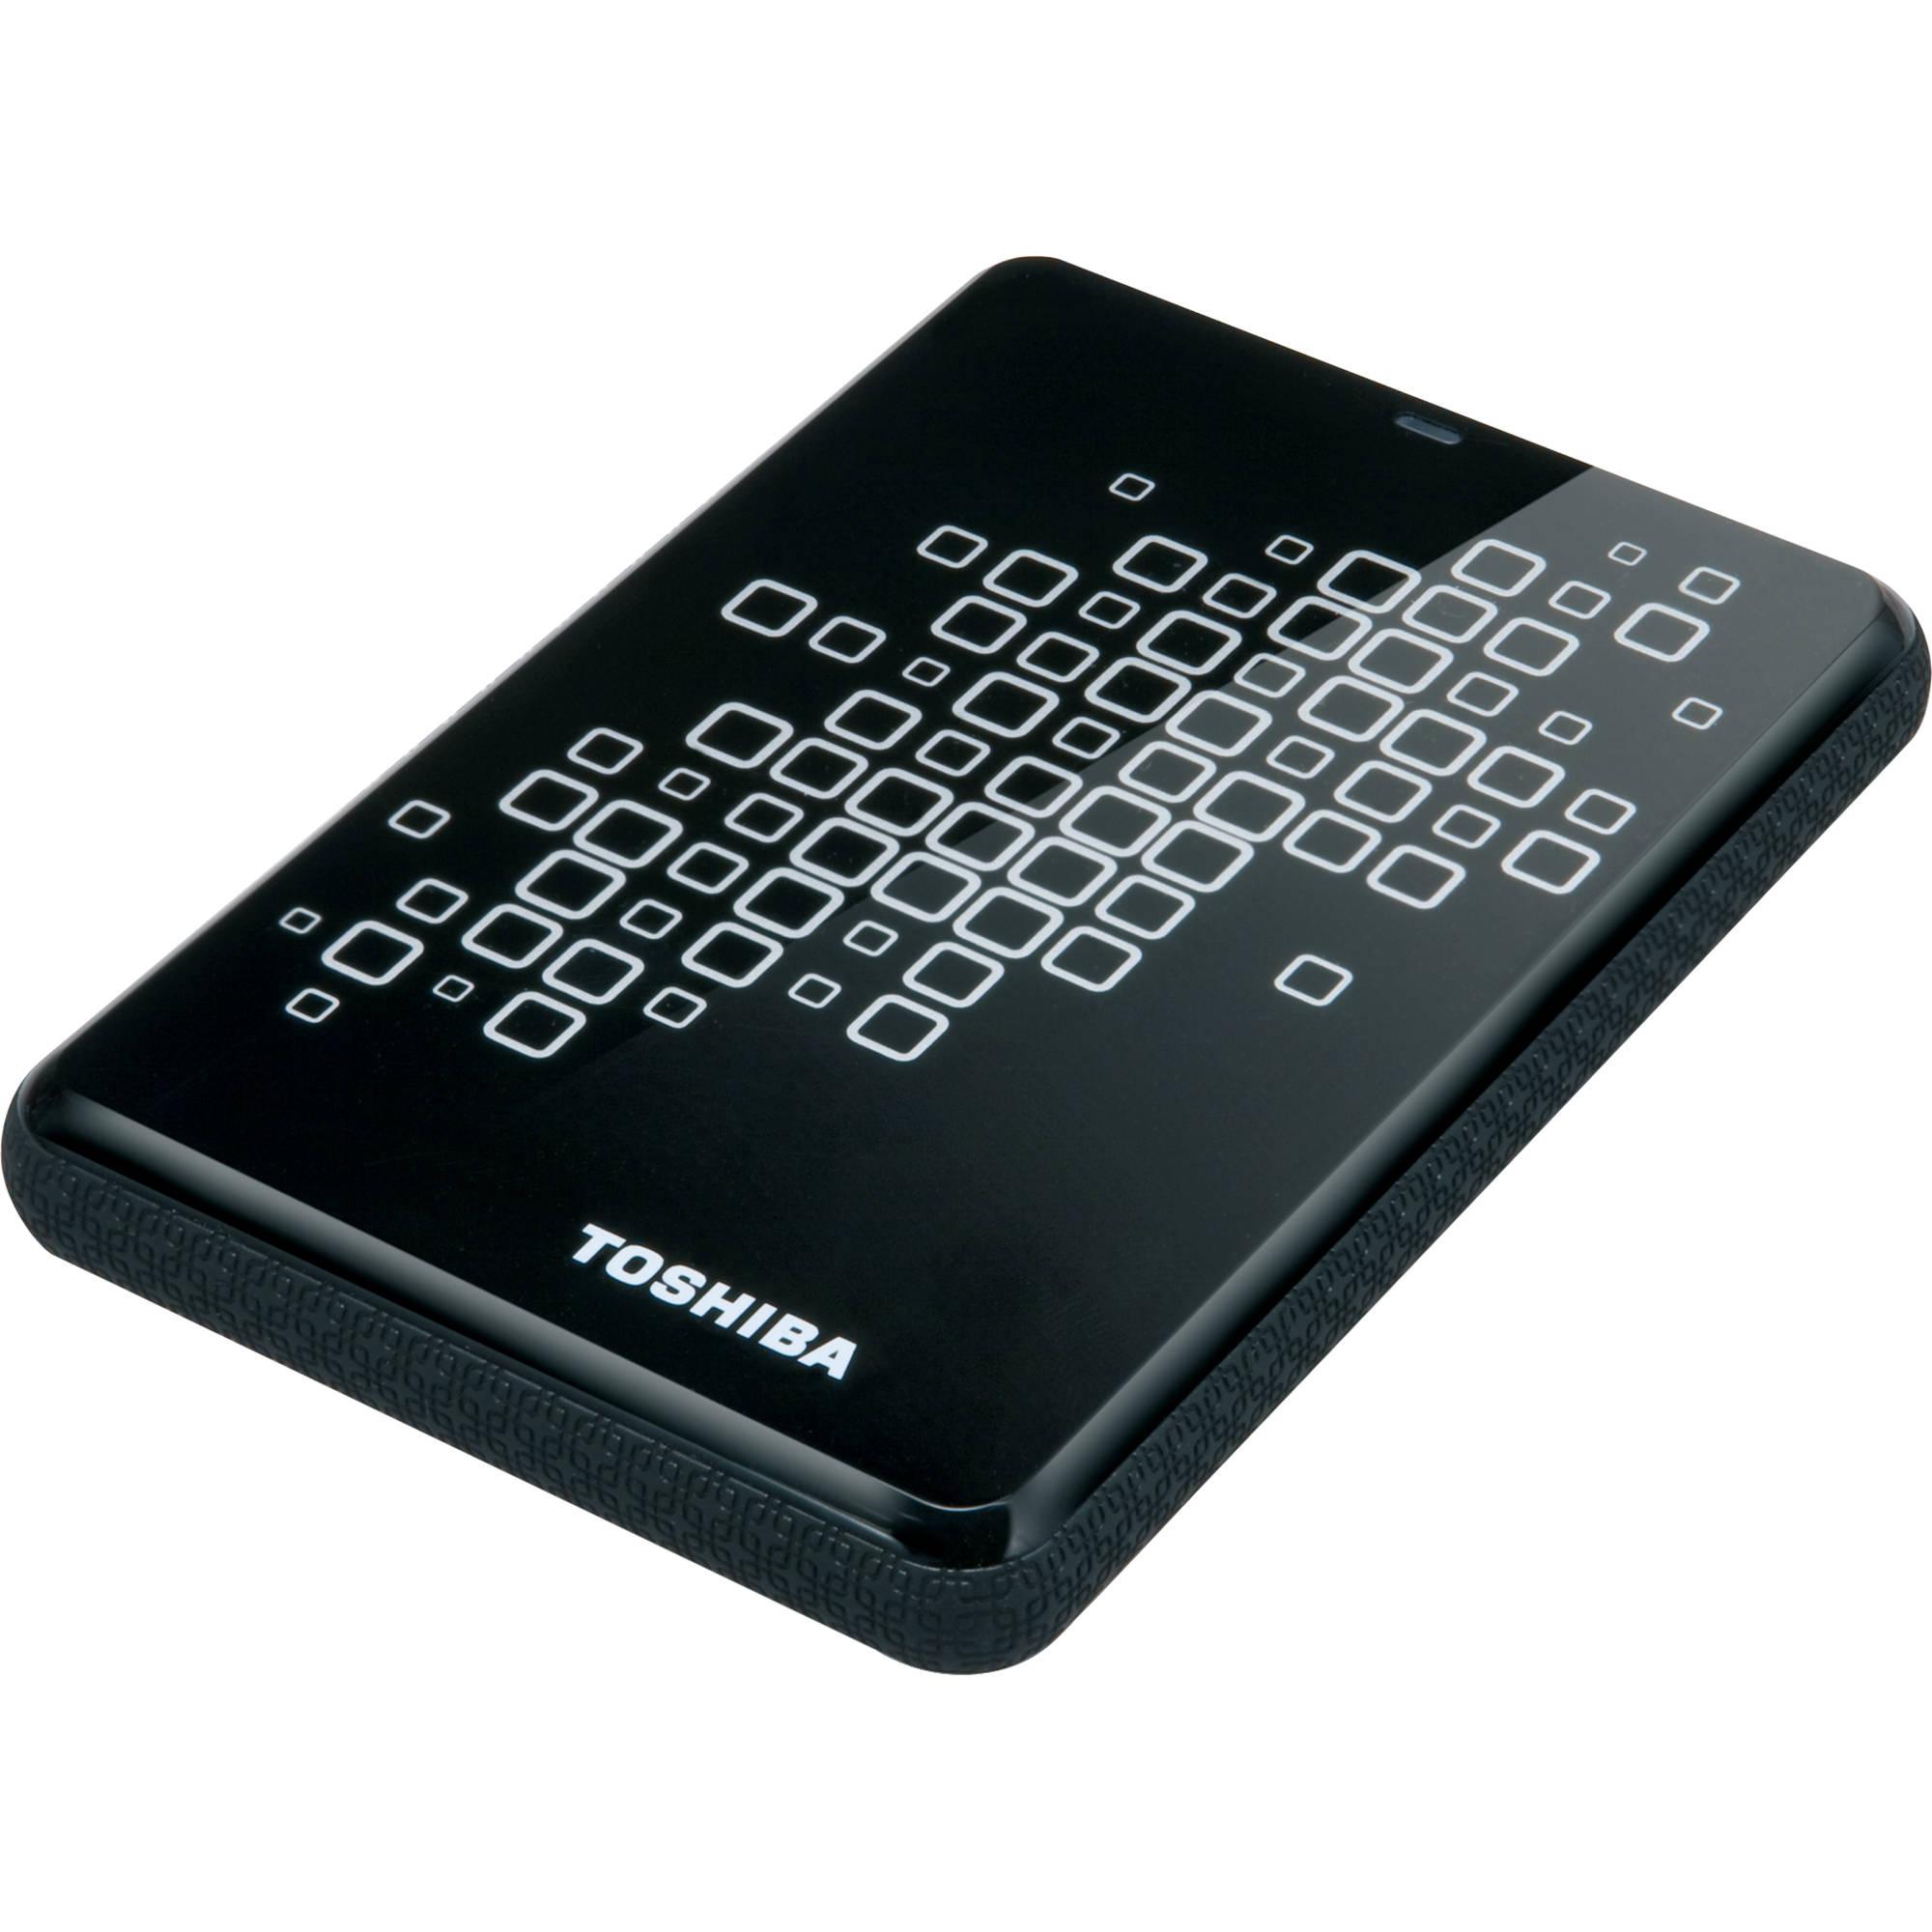 toshiba portable hard drive review